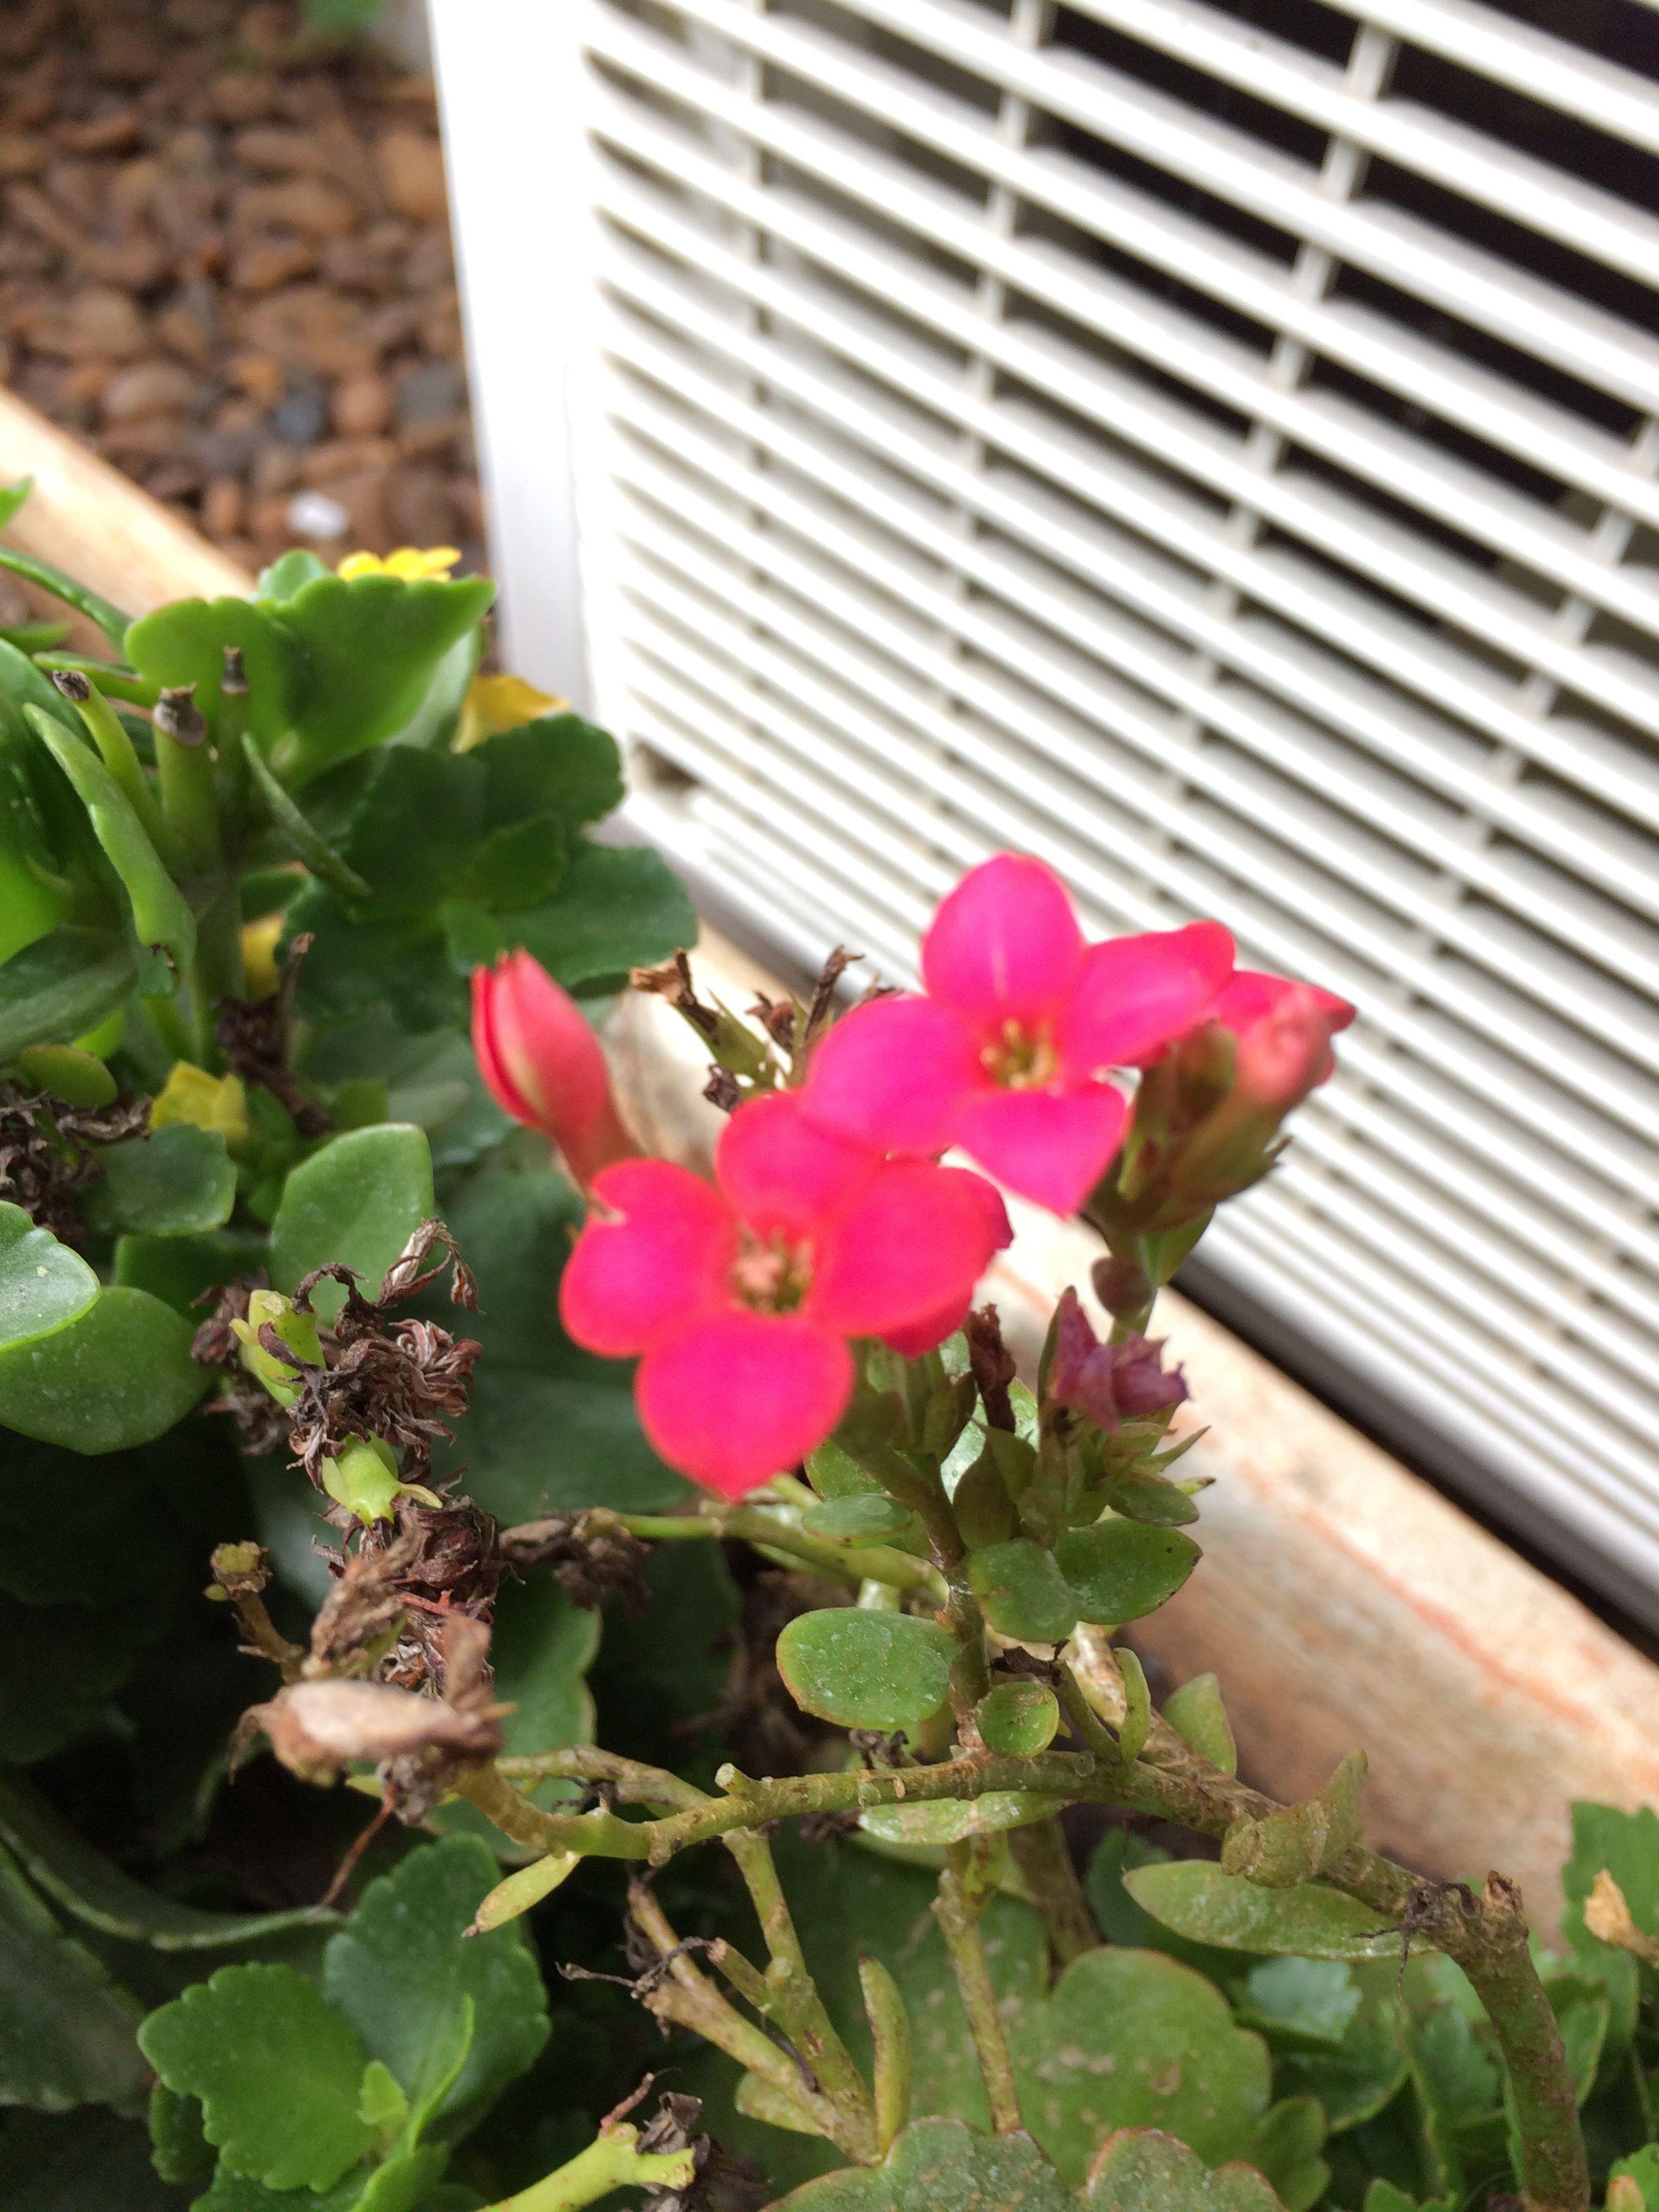 Pin by doris mardegan on flores pinterest